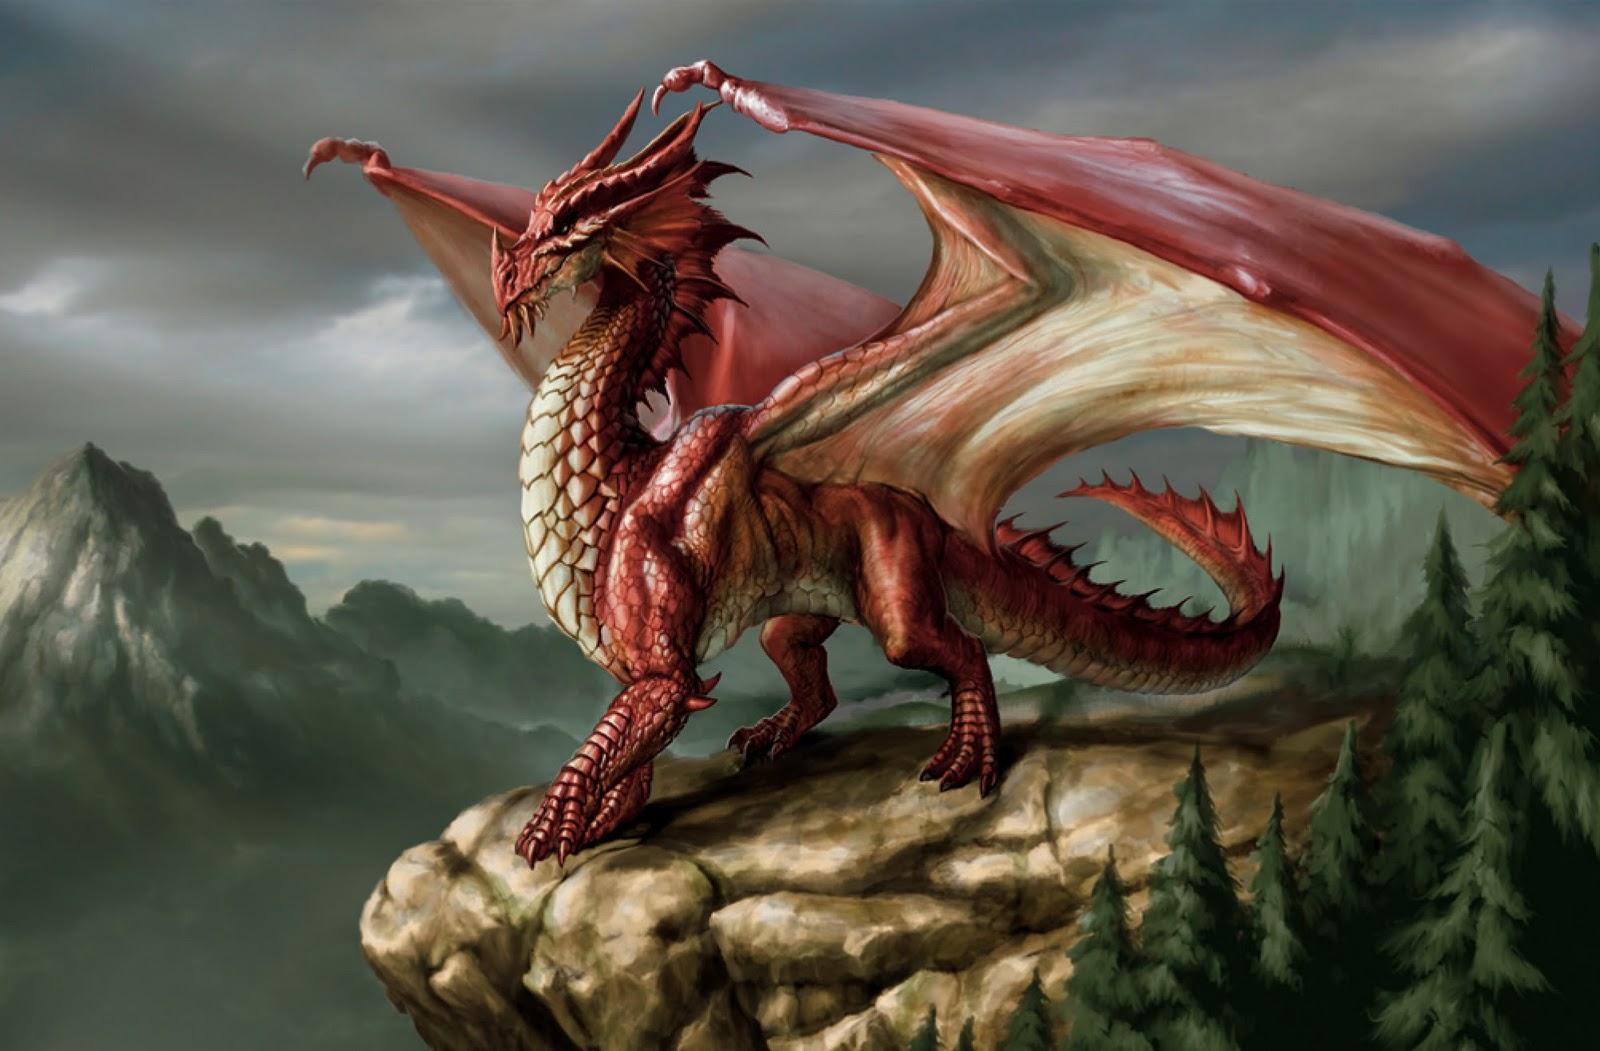 image red dragon jpg quondam et futurus fandom powered by wikia